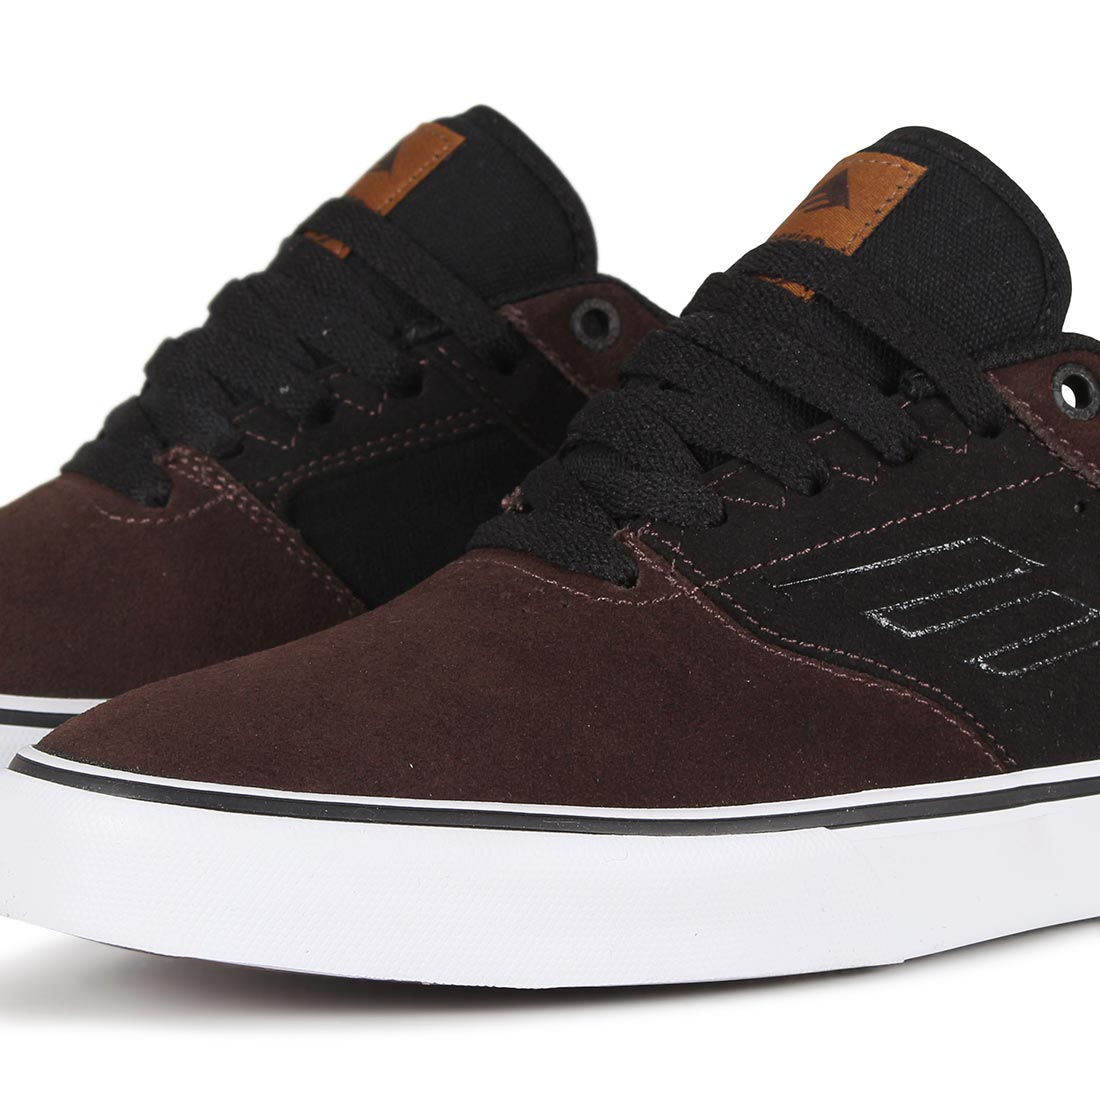 Emerica Reynolds Low Vulc Shoes - Brown